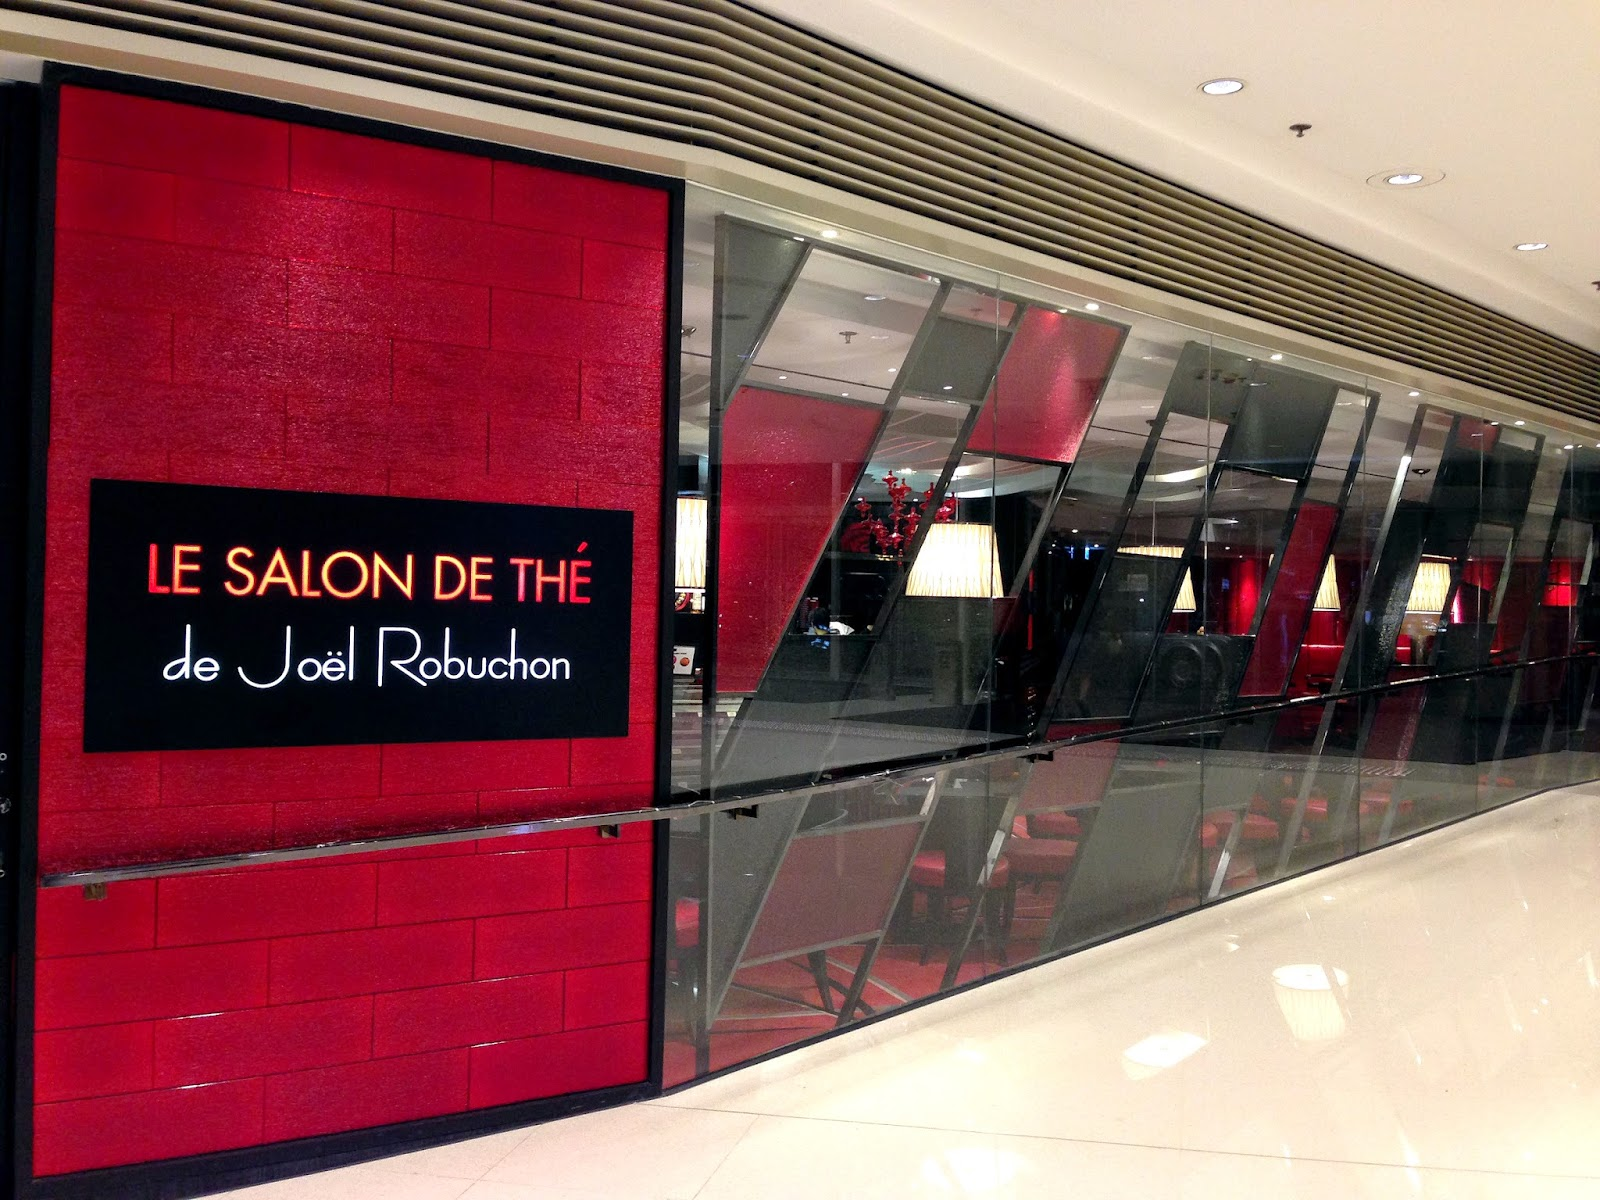 Le salon de th de jo l robuchon elements hong kong - Salon de joel robuchon ...